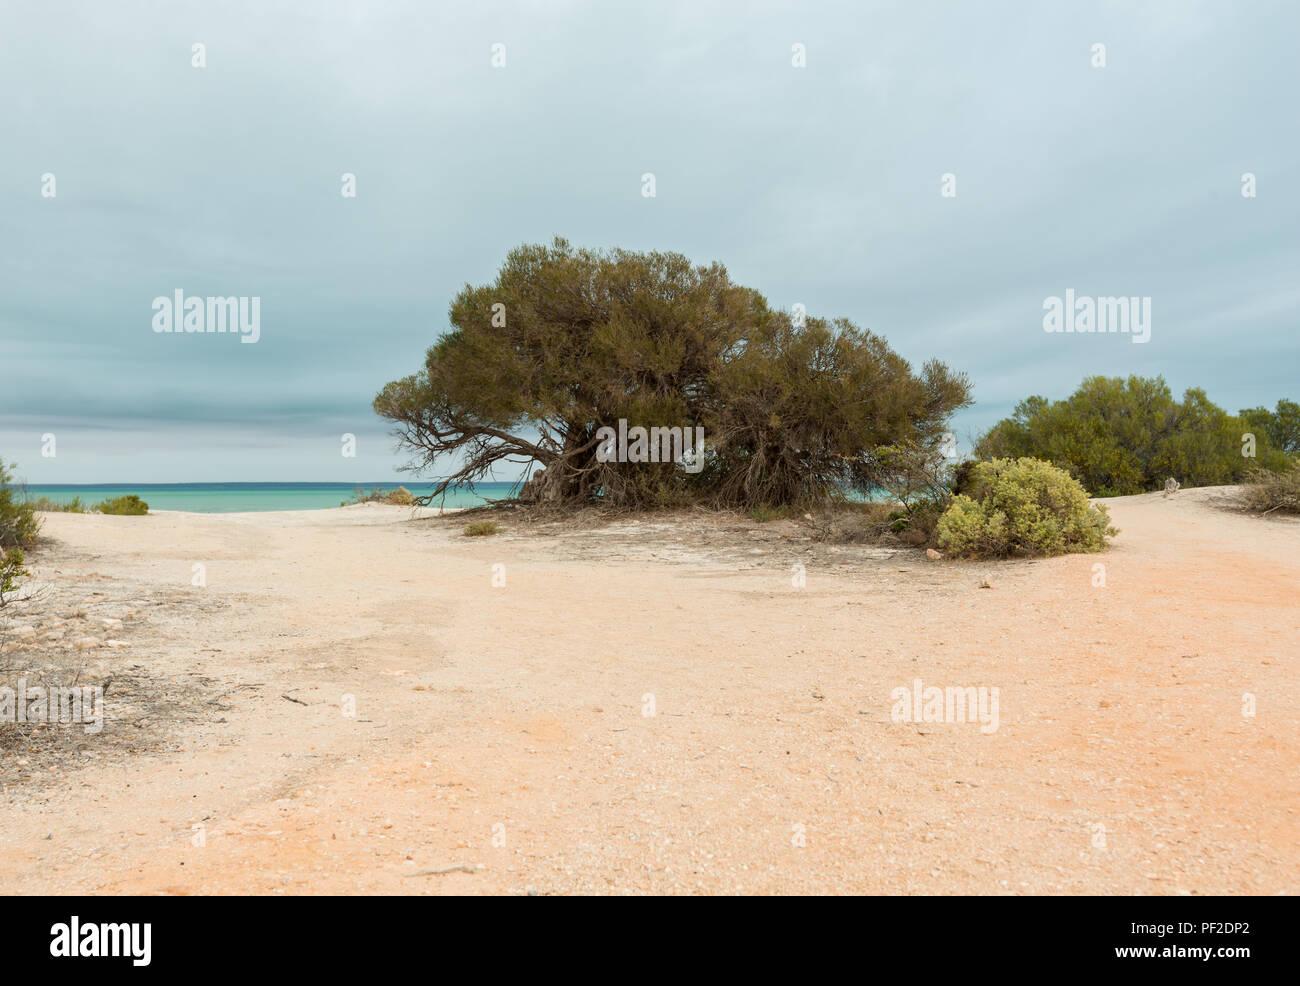 A bush in the sand, at shark bay western Australia - Stock Image